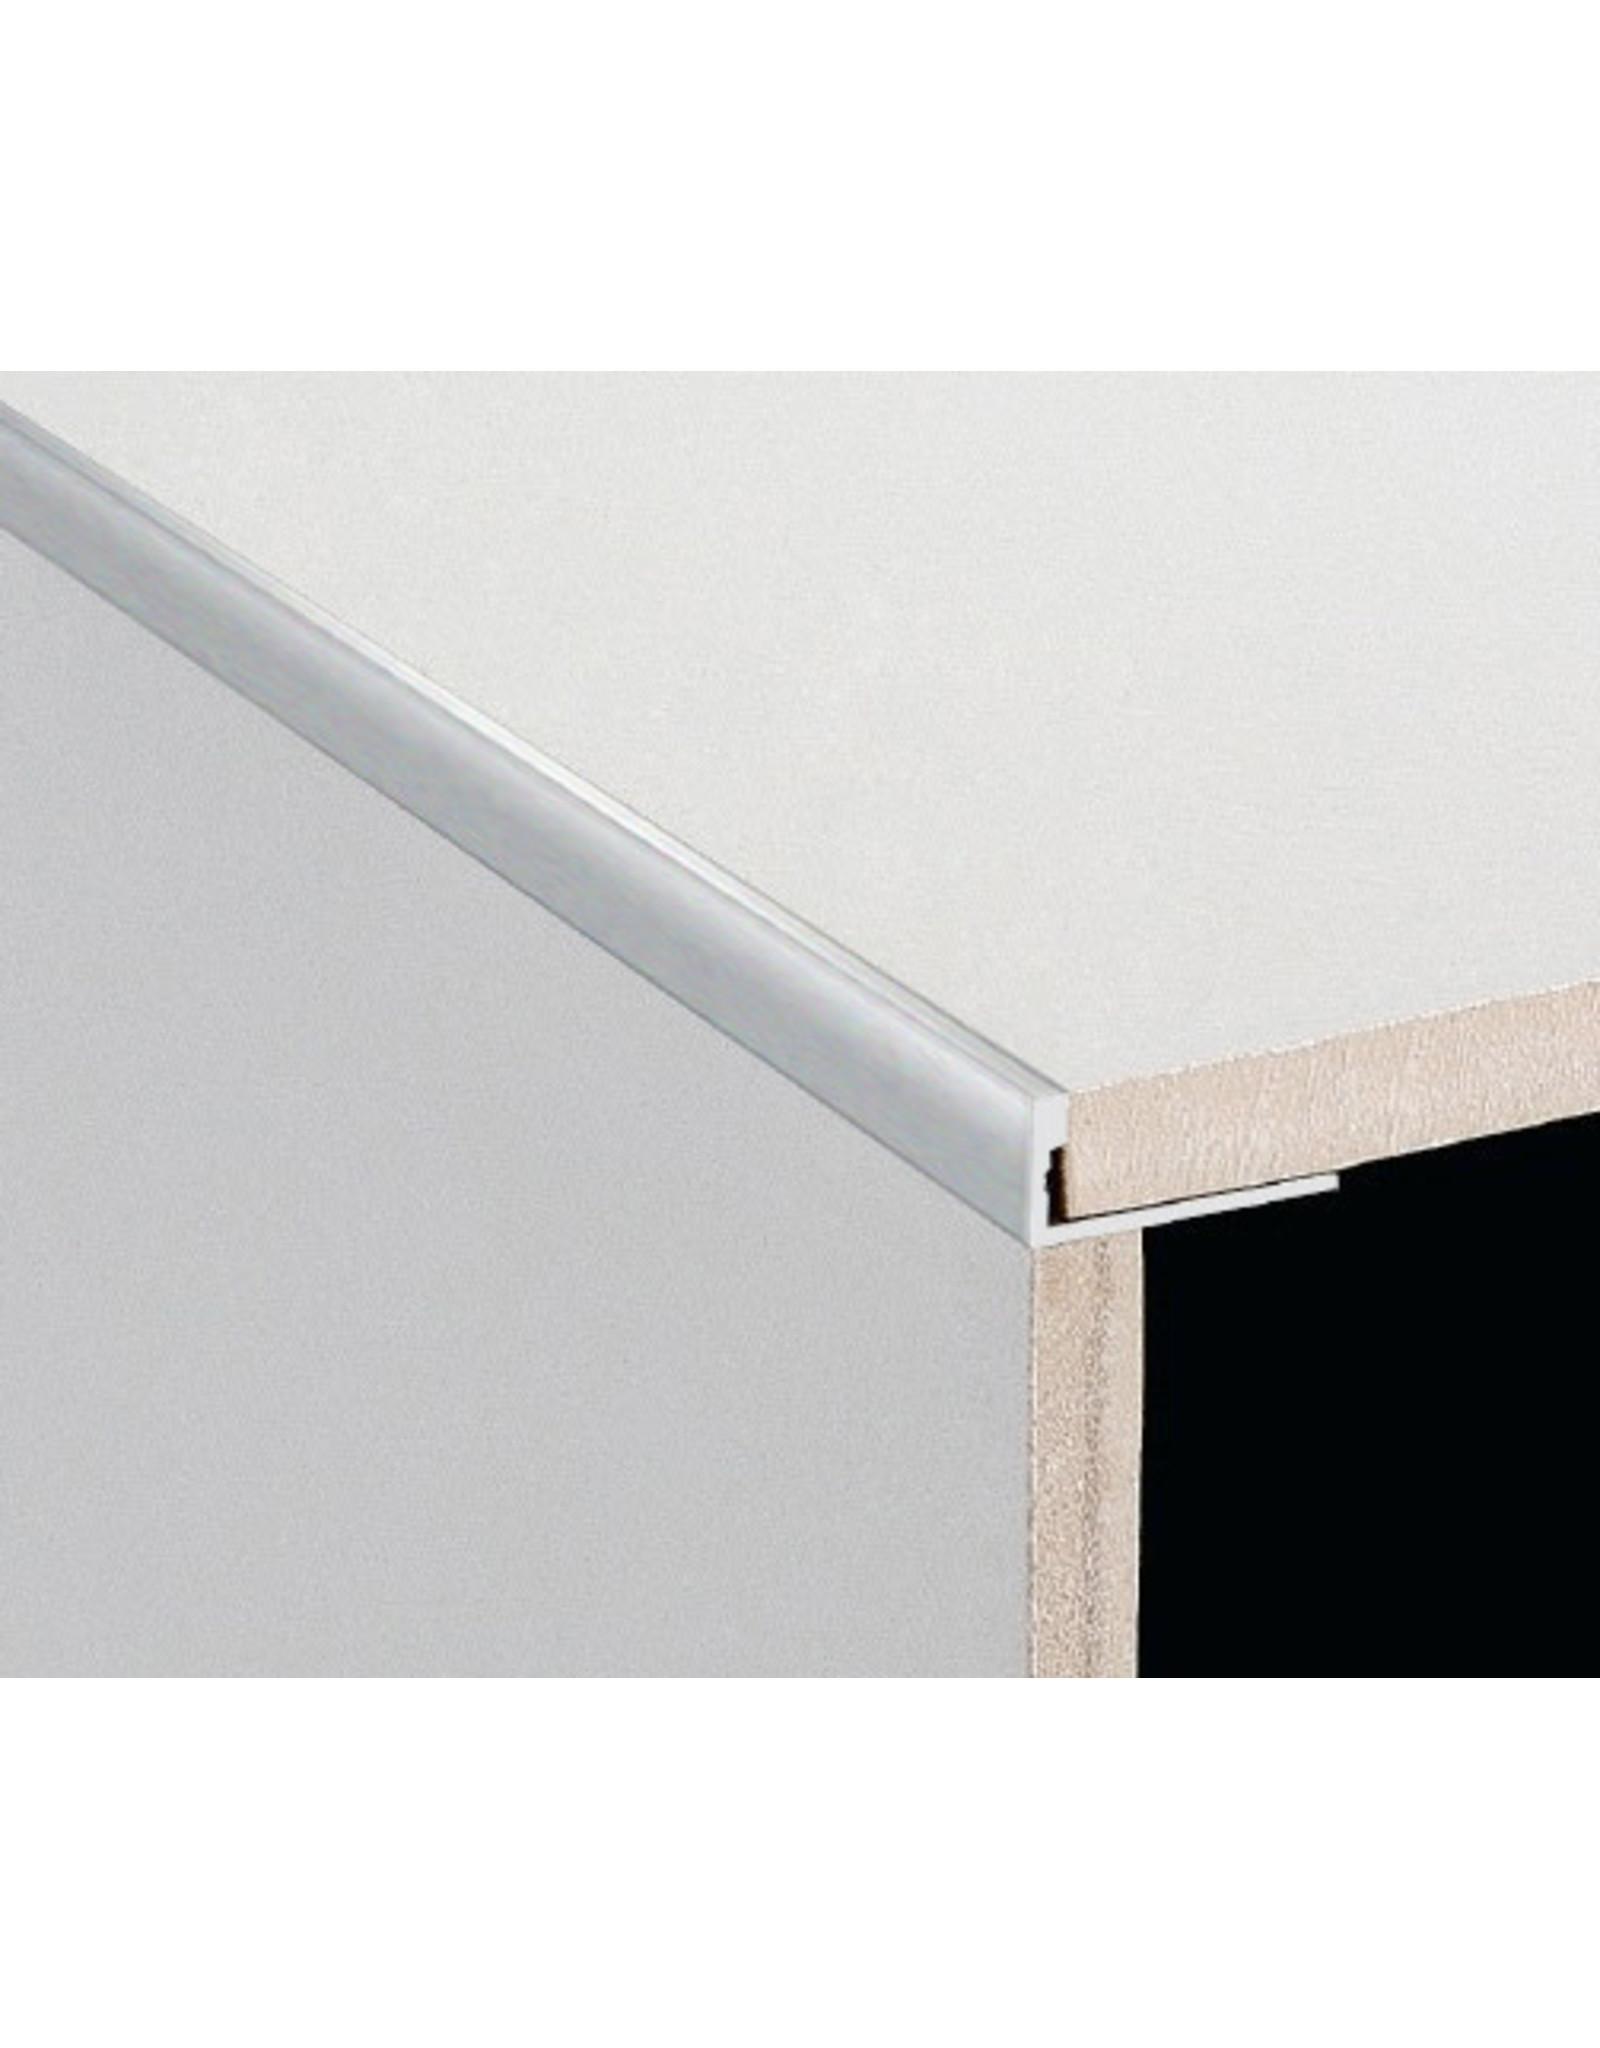 DTA 25mm DTA Aluminium L-Shape Trim Brushed Silver